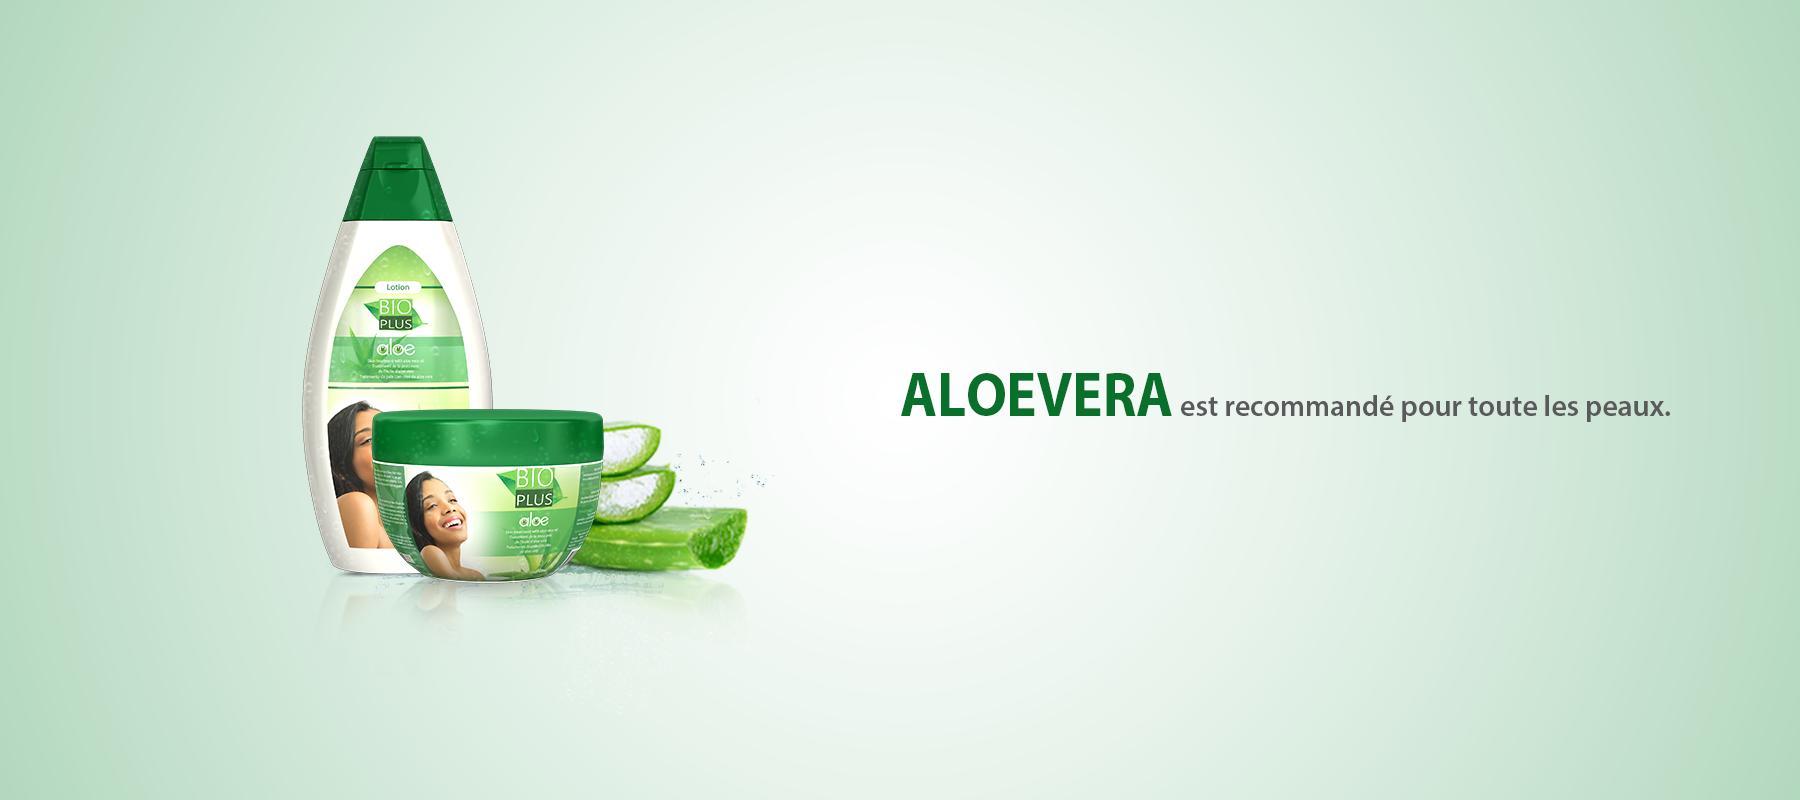 Banner of Bio Plus Aloevera Product